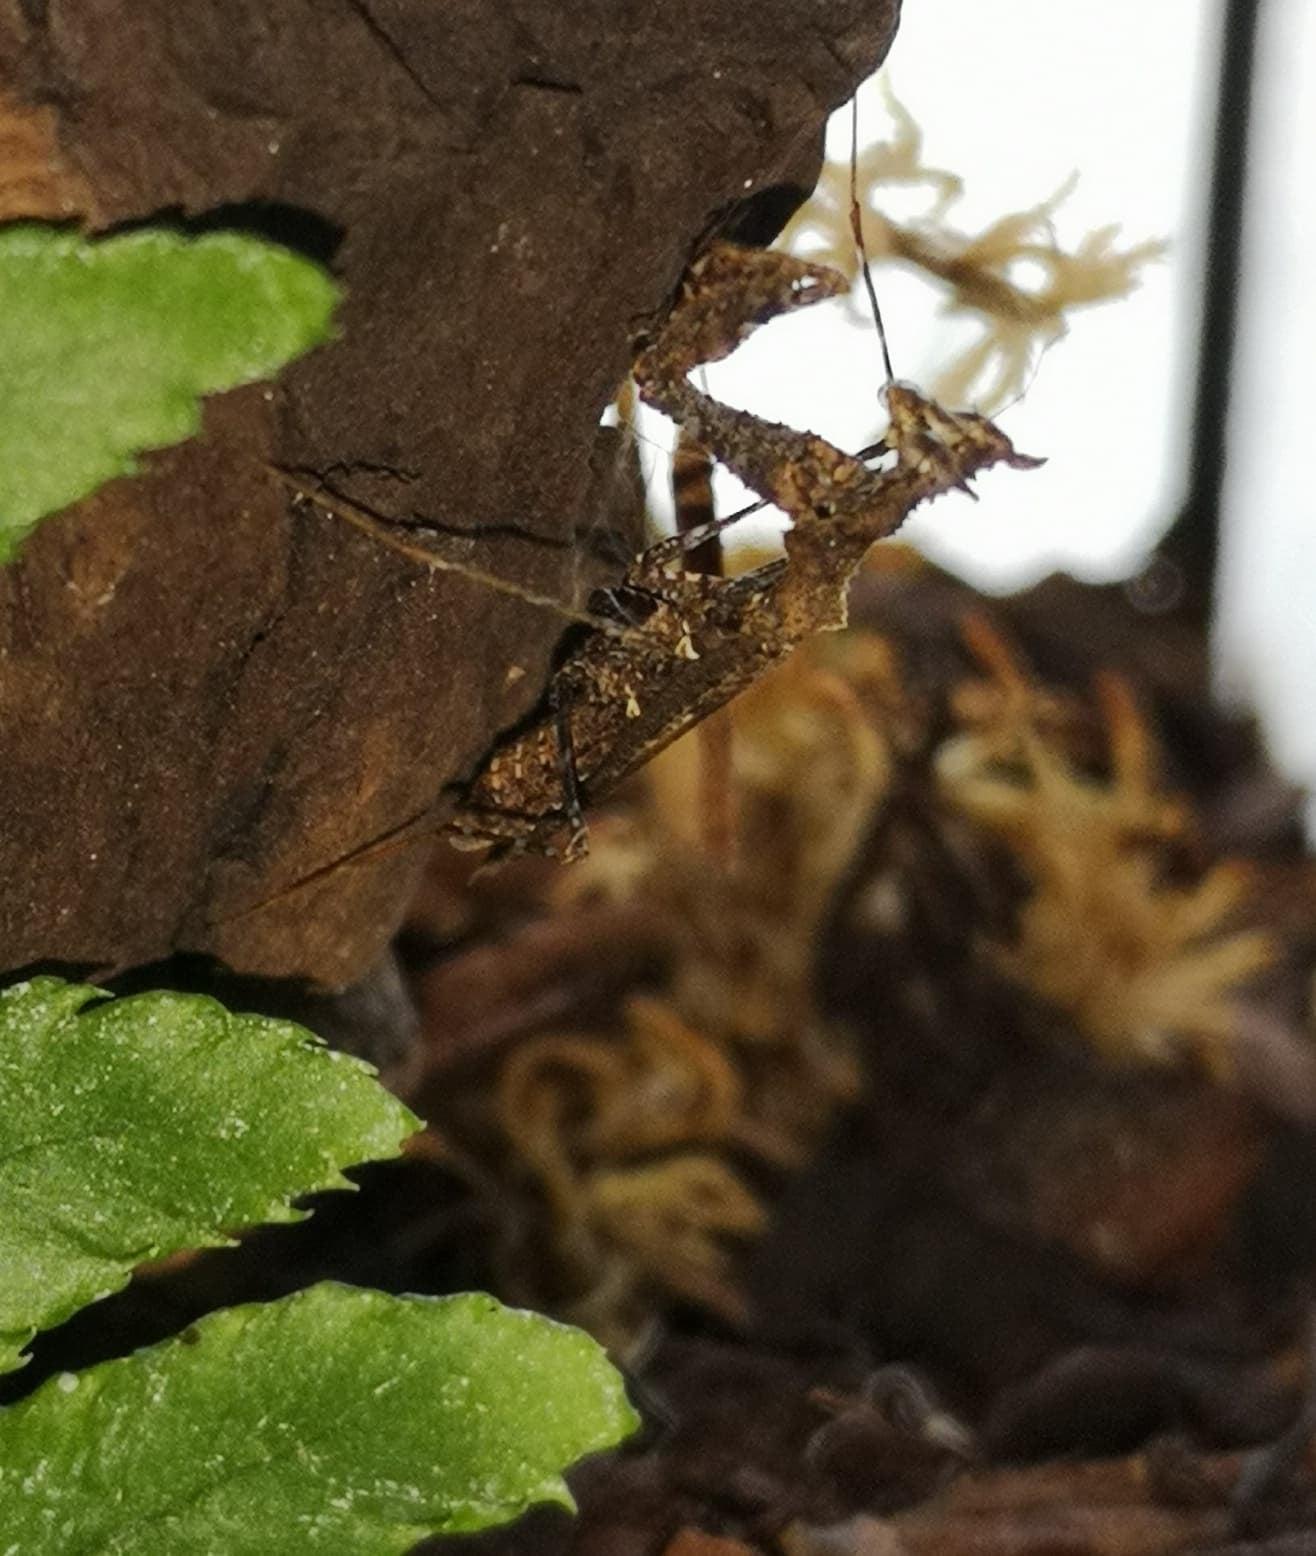 Moss mantis (Haania vitalisi) L3 for sale-69934041_384729622441001_3314246006840754176_o.jpg